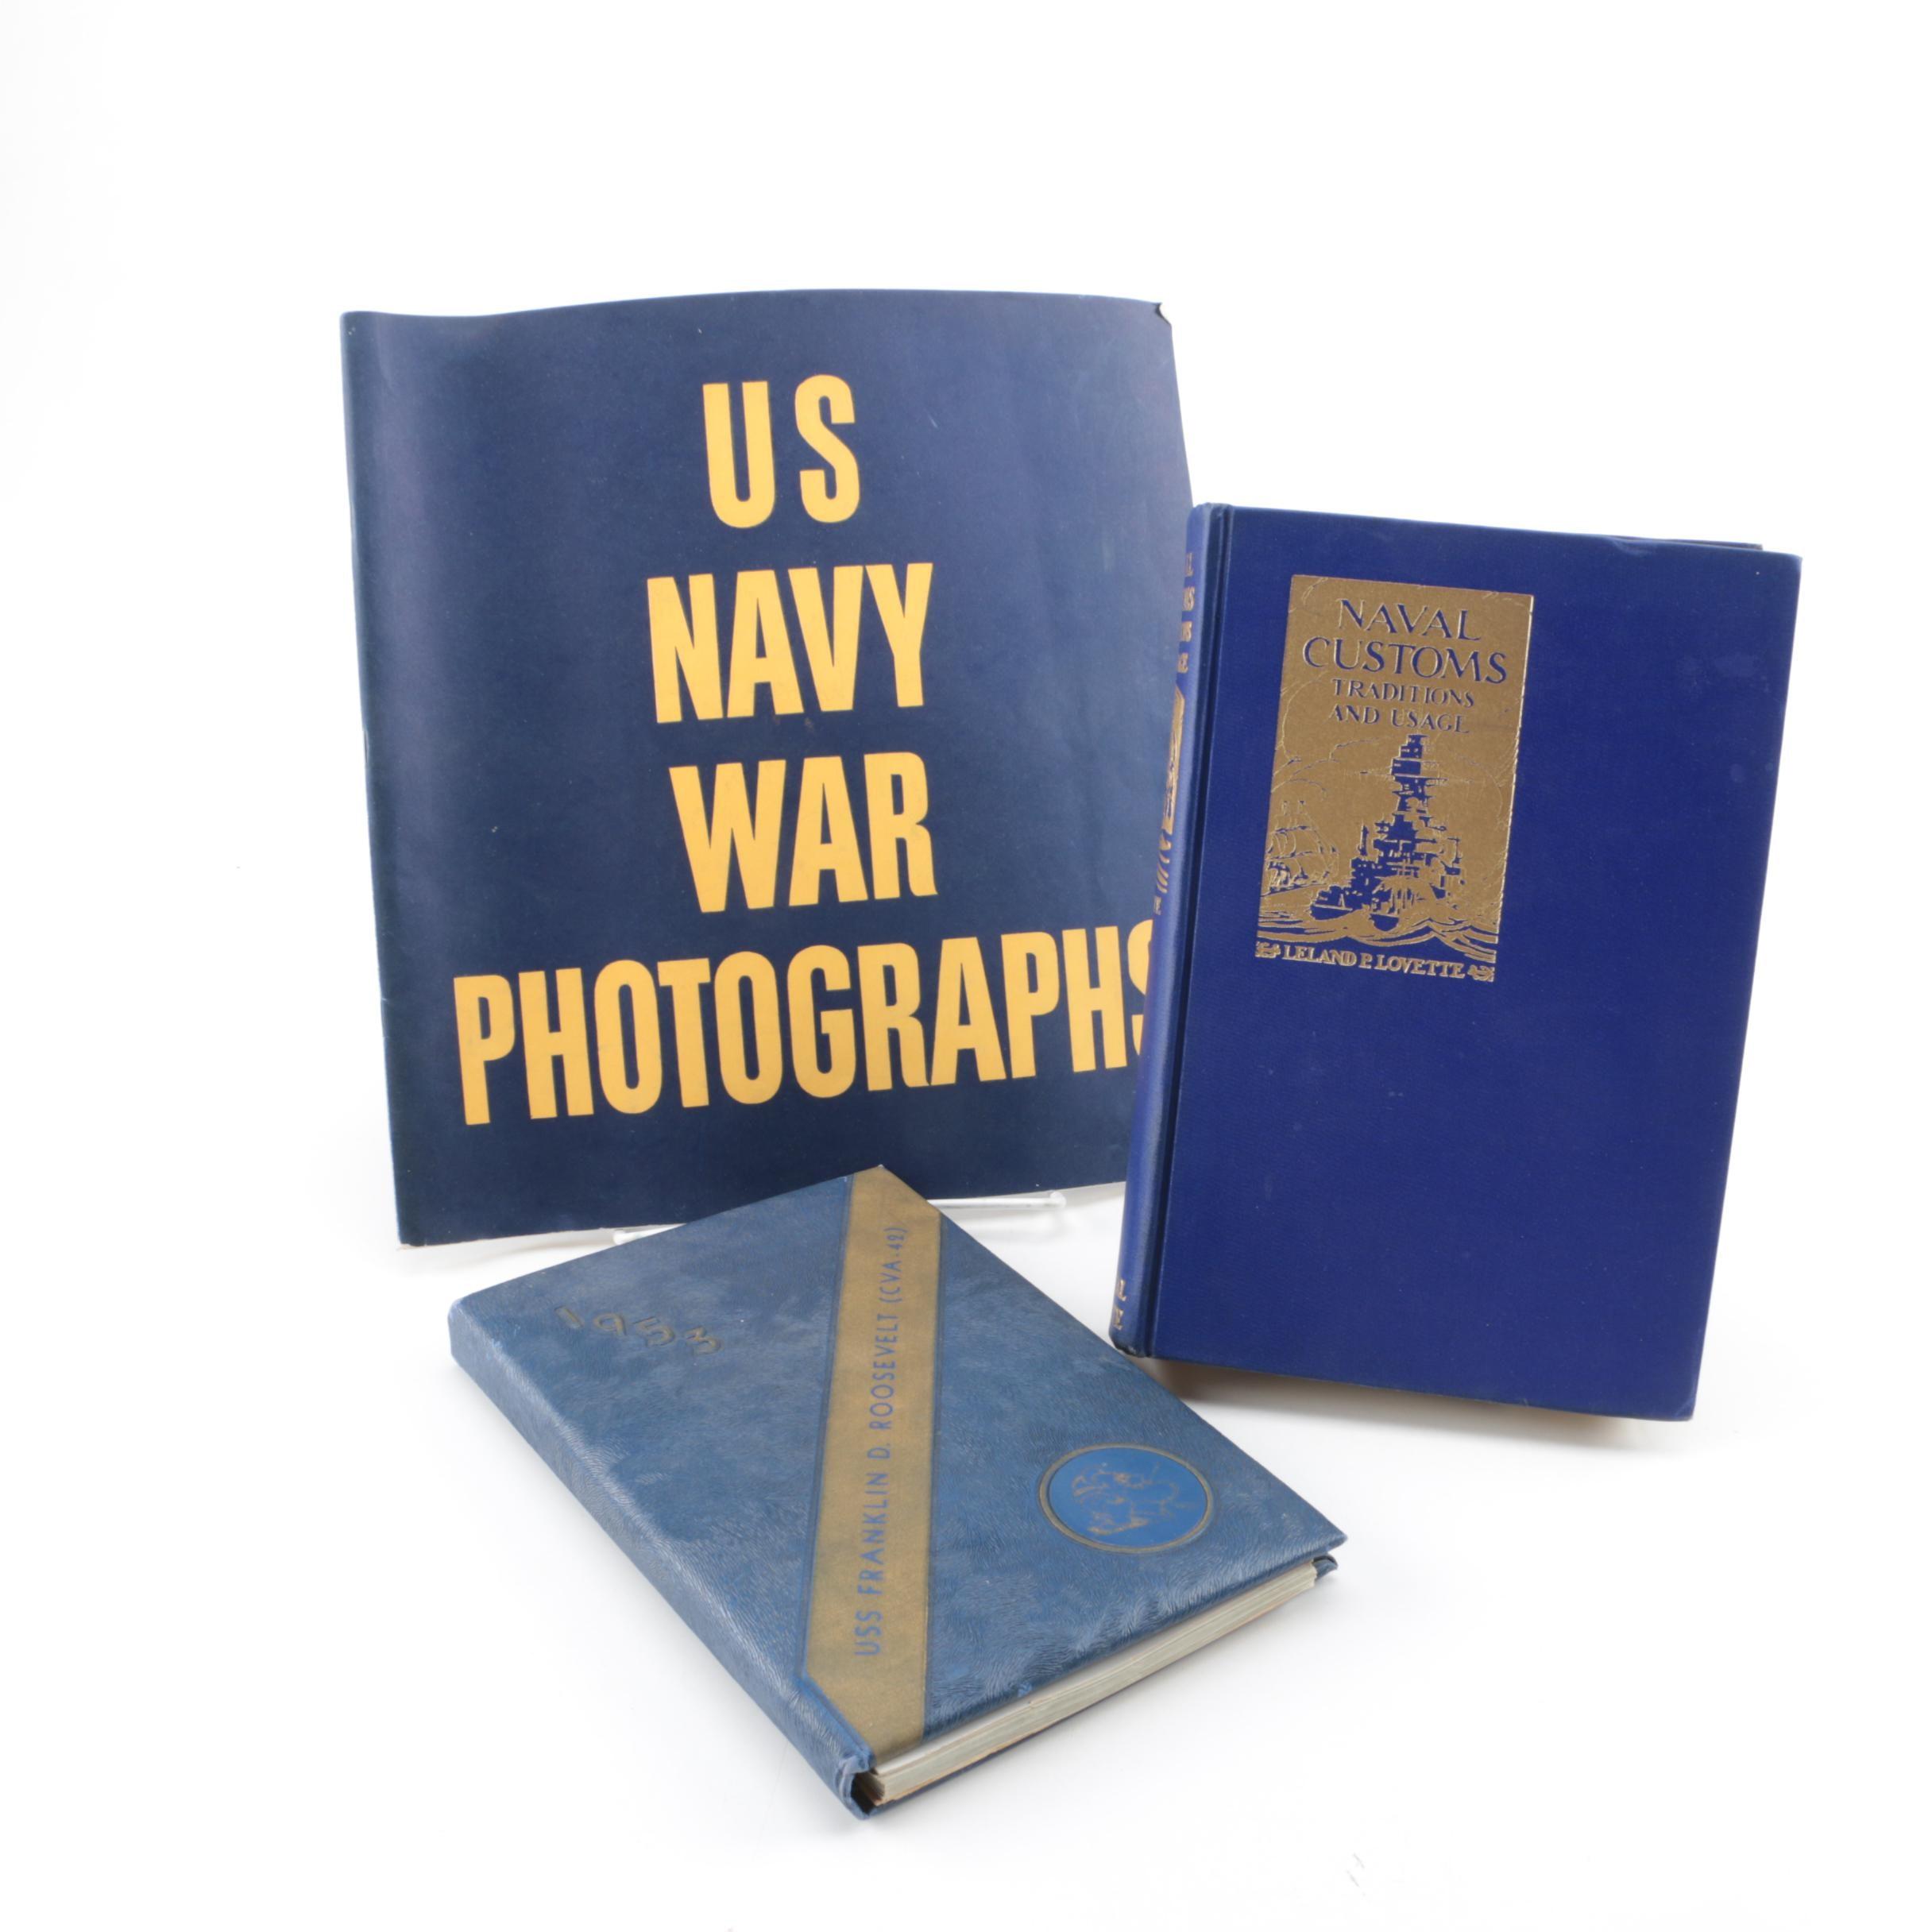 Vintage U.S. Navy Books